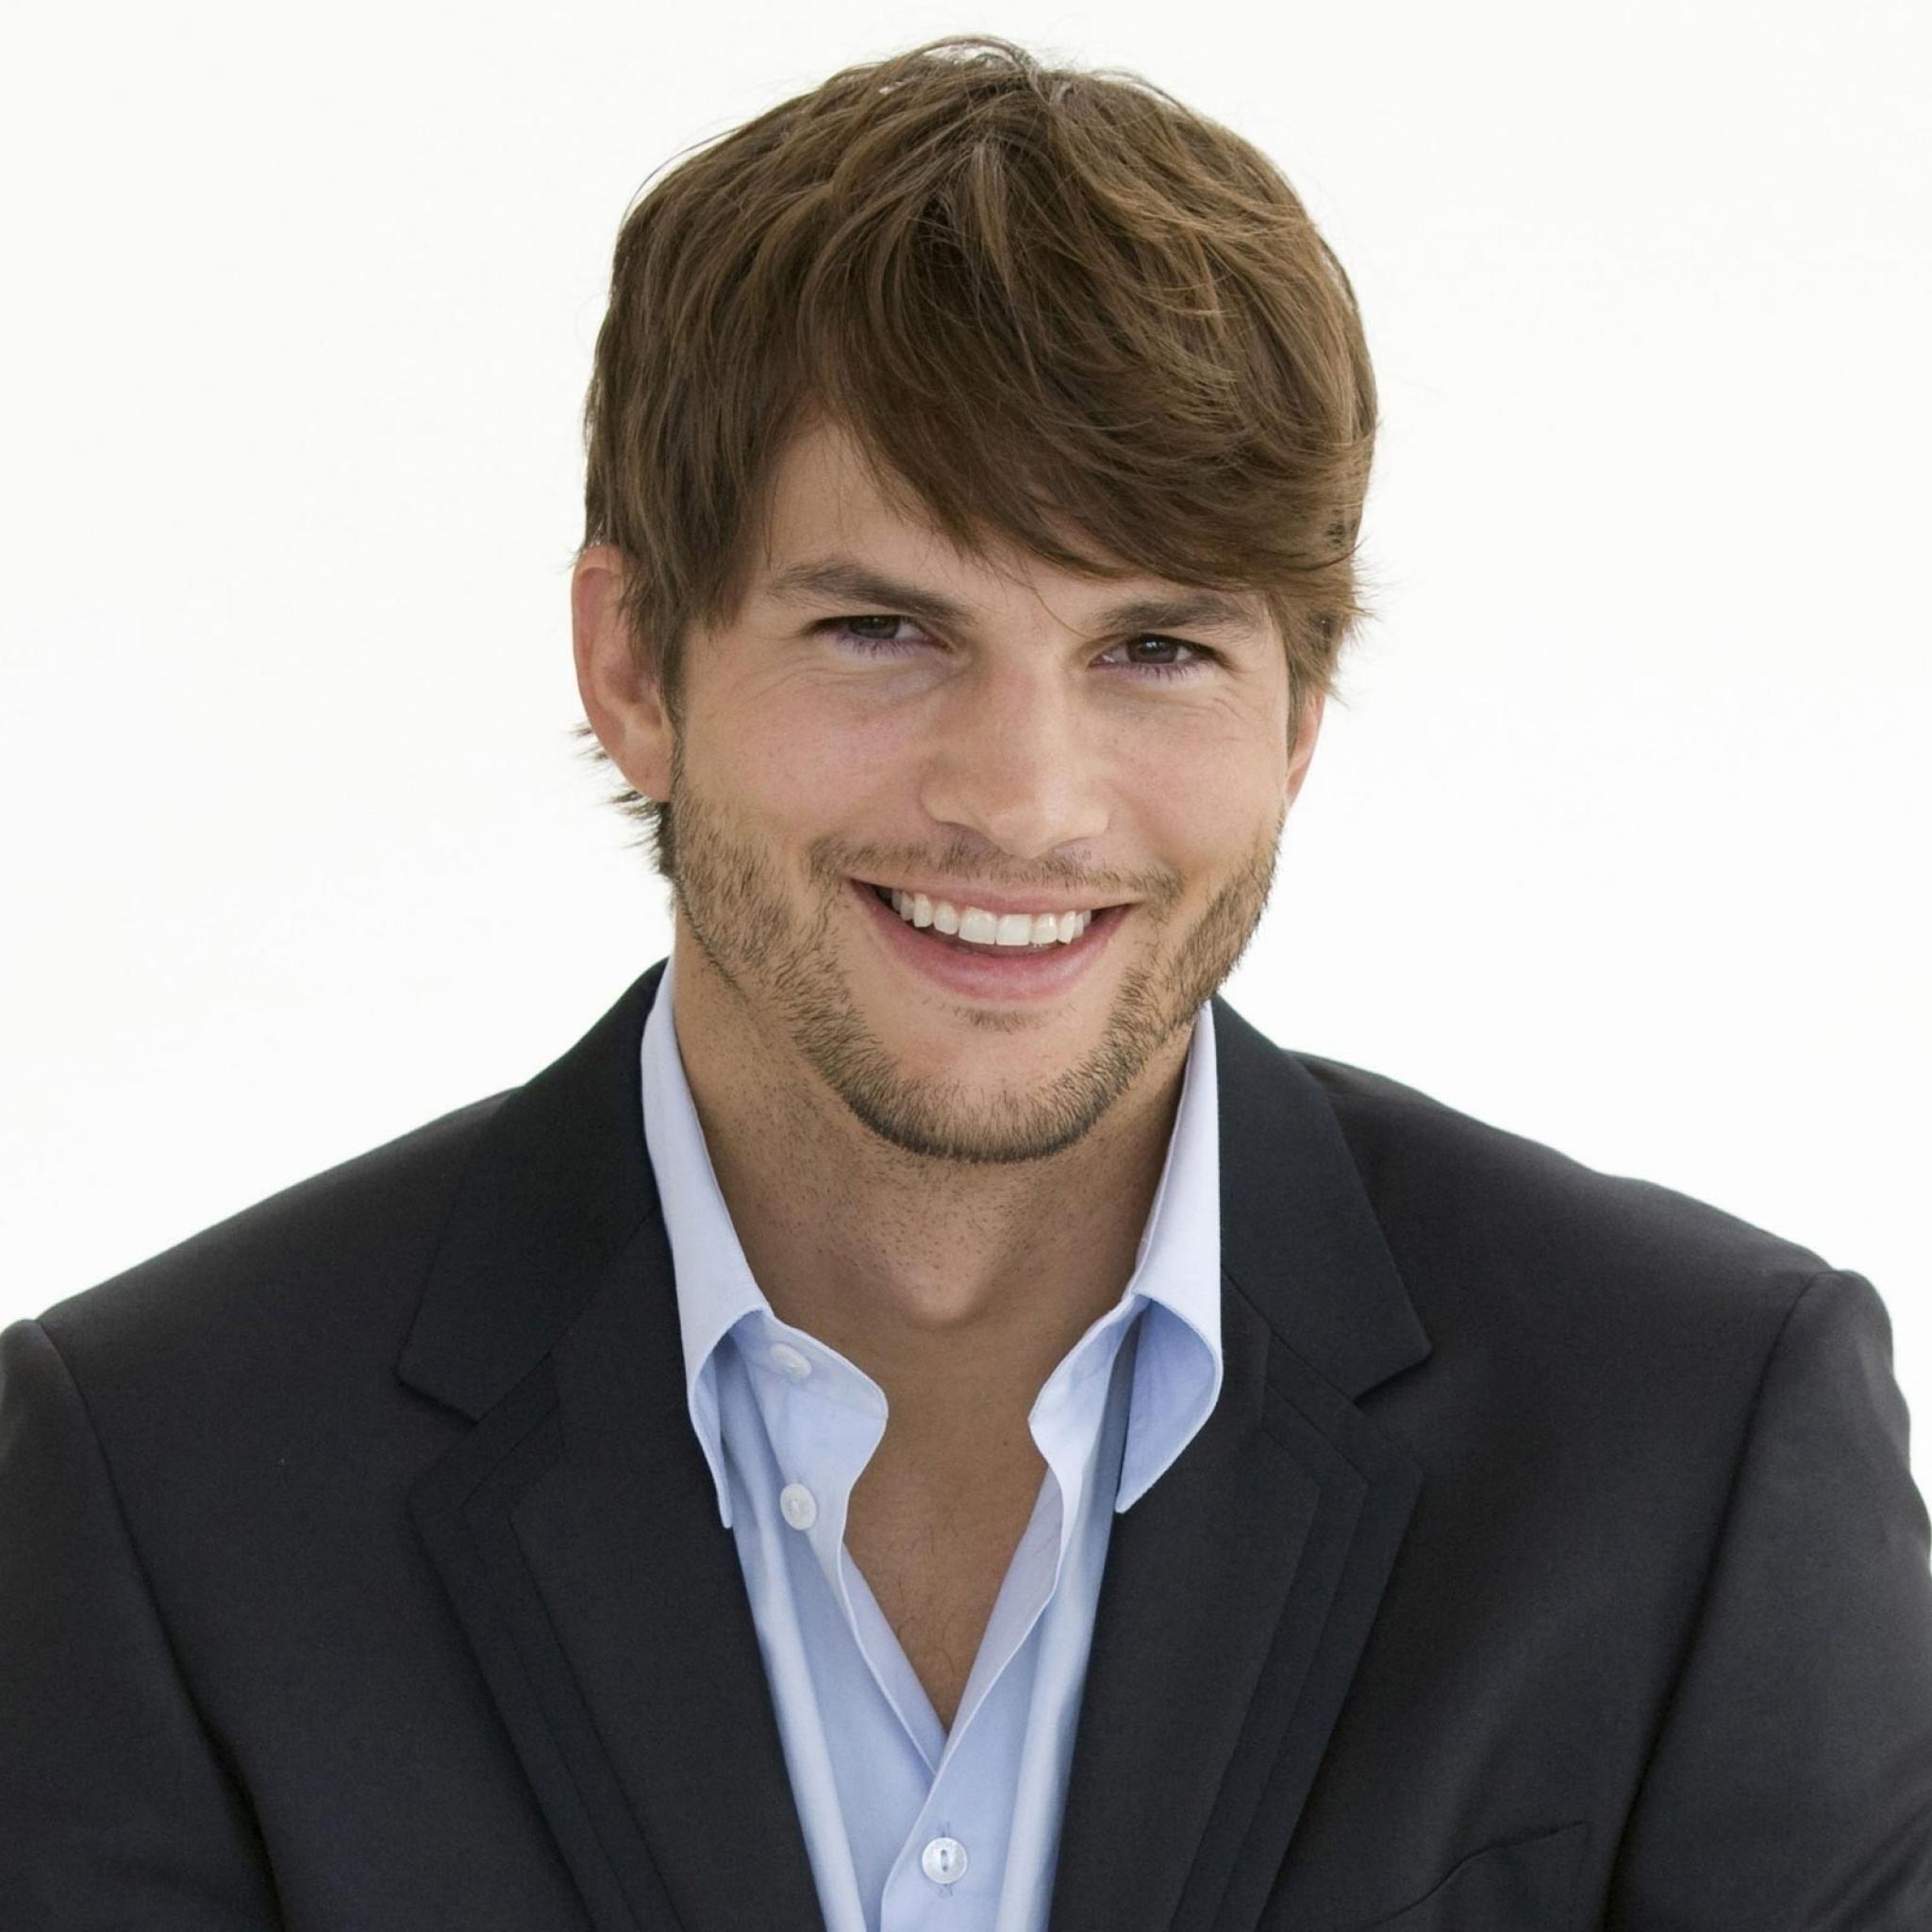 Charitybuzz Over Ashton Kutcher' Twitter Account